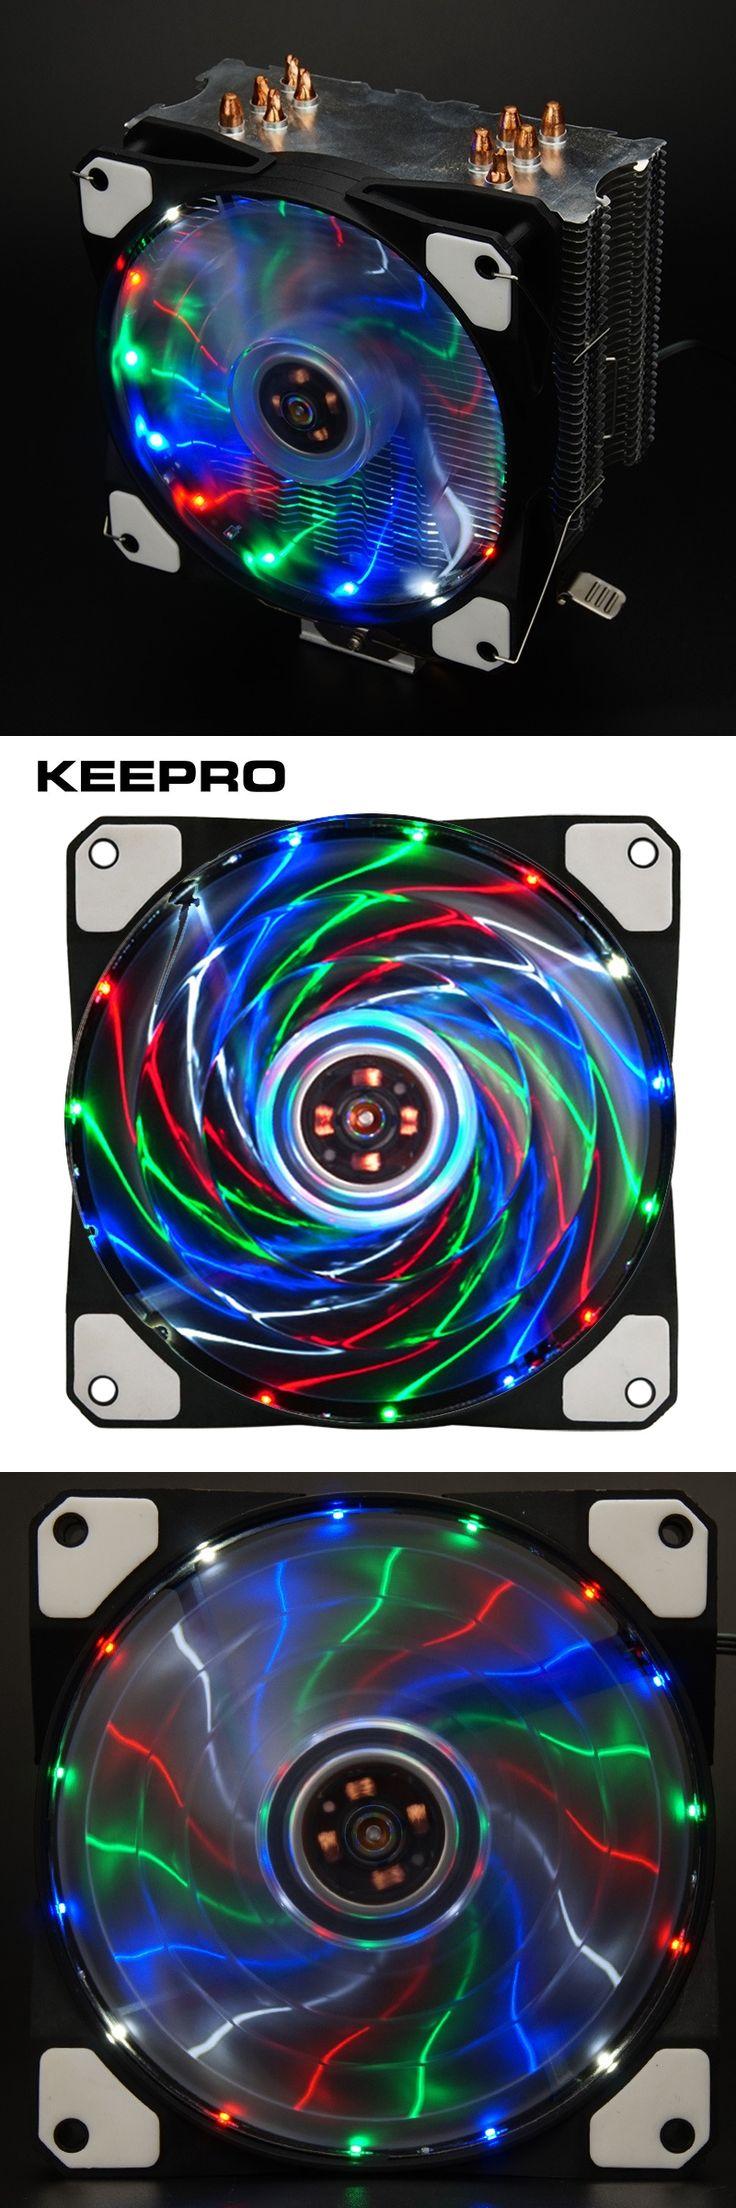 KEEPRO Original 15 Lights Silent Fan 3Pin/4Pin Cooler Fan Radiator 12V LED Light Heatsink Computer Case Fan Air Cooling 120mm